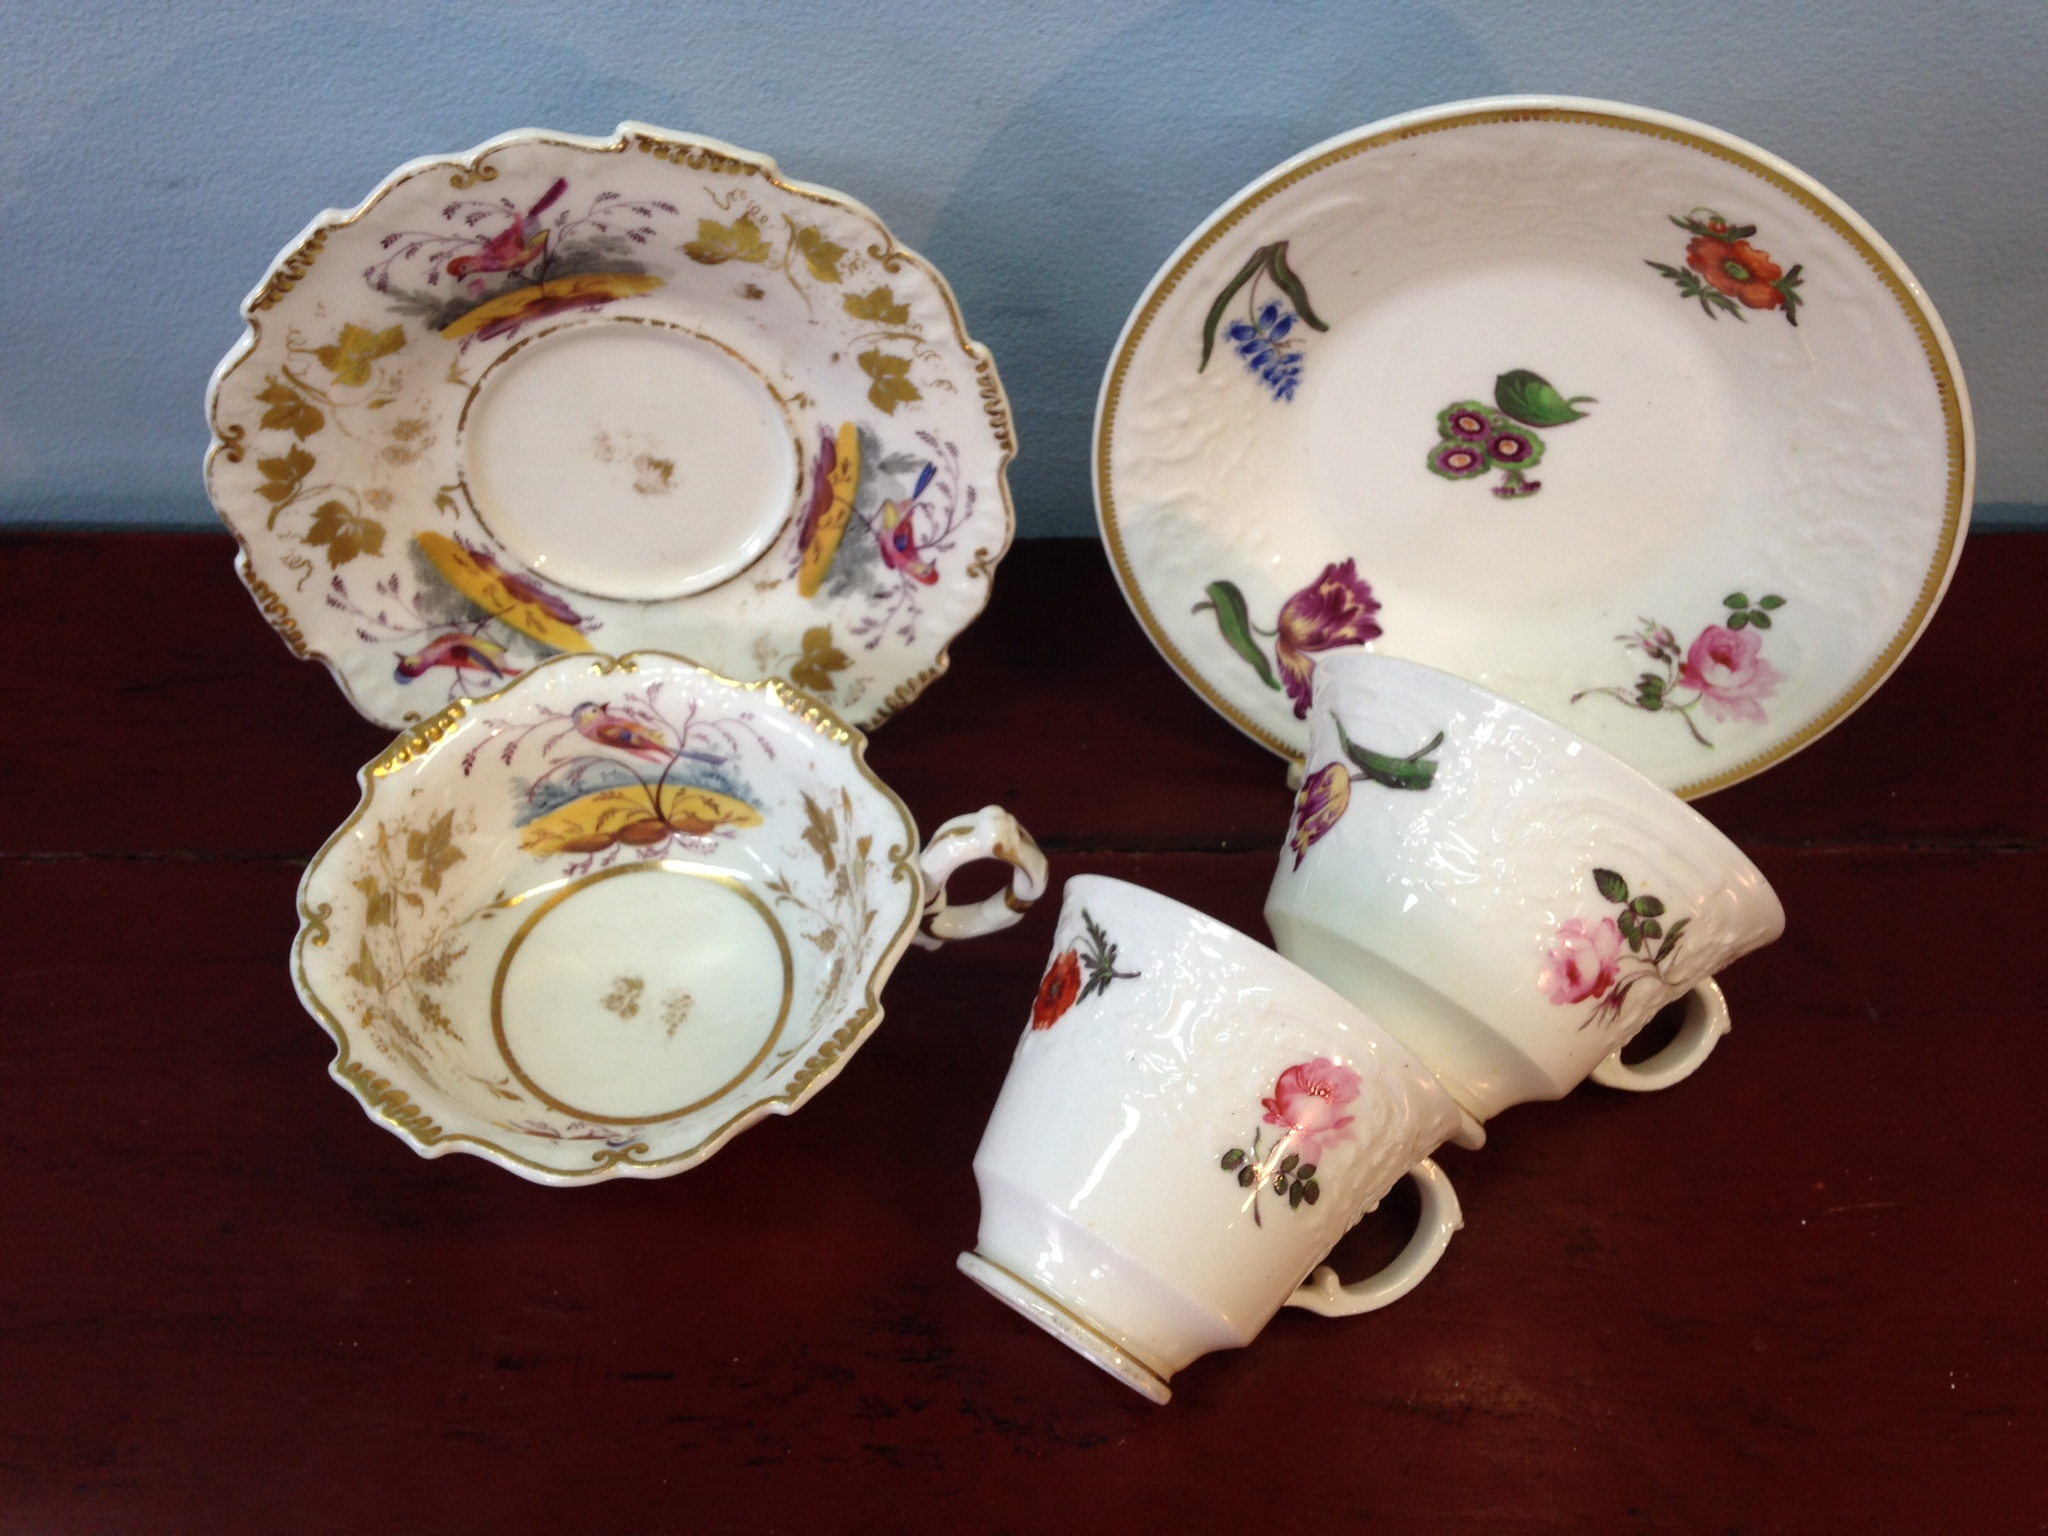 Lot 7 - Daniel porcelain cup and saucer c1830 and Coalport felspar trio